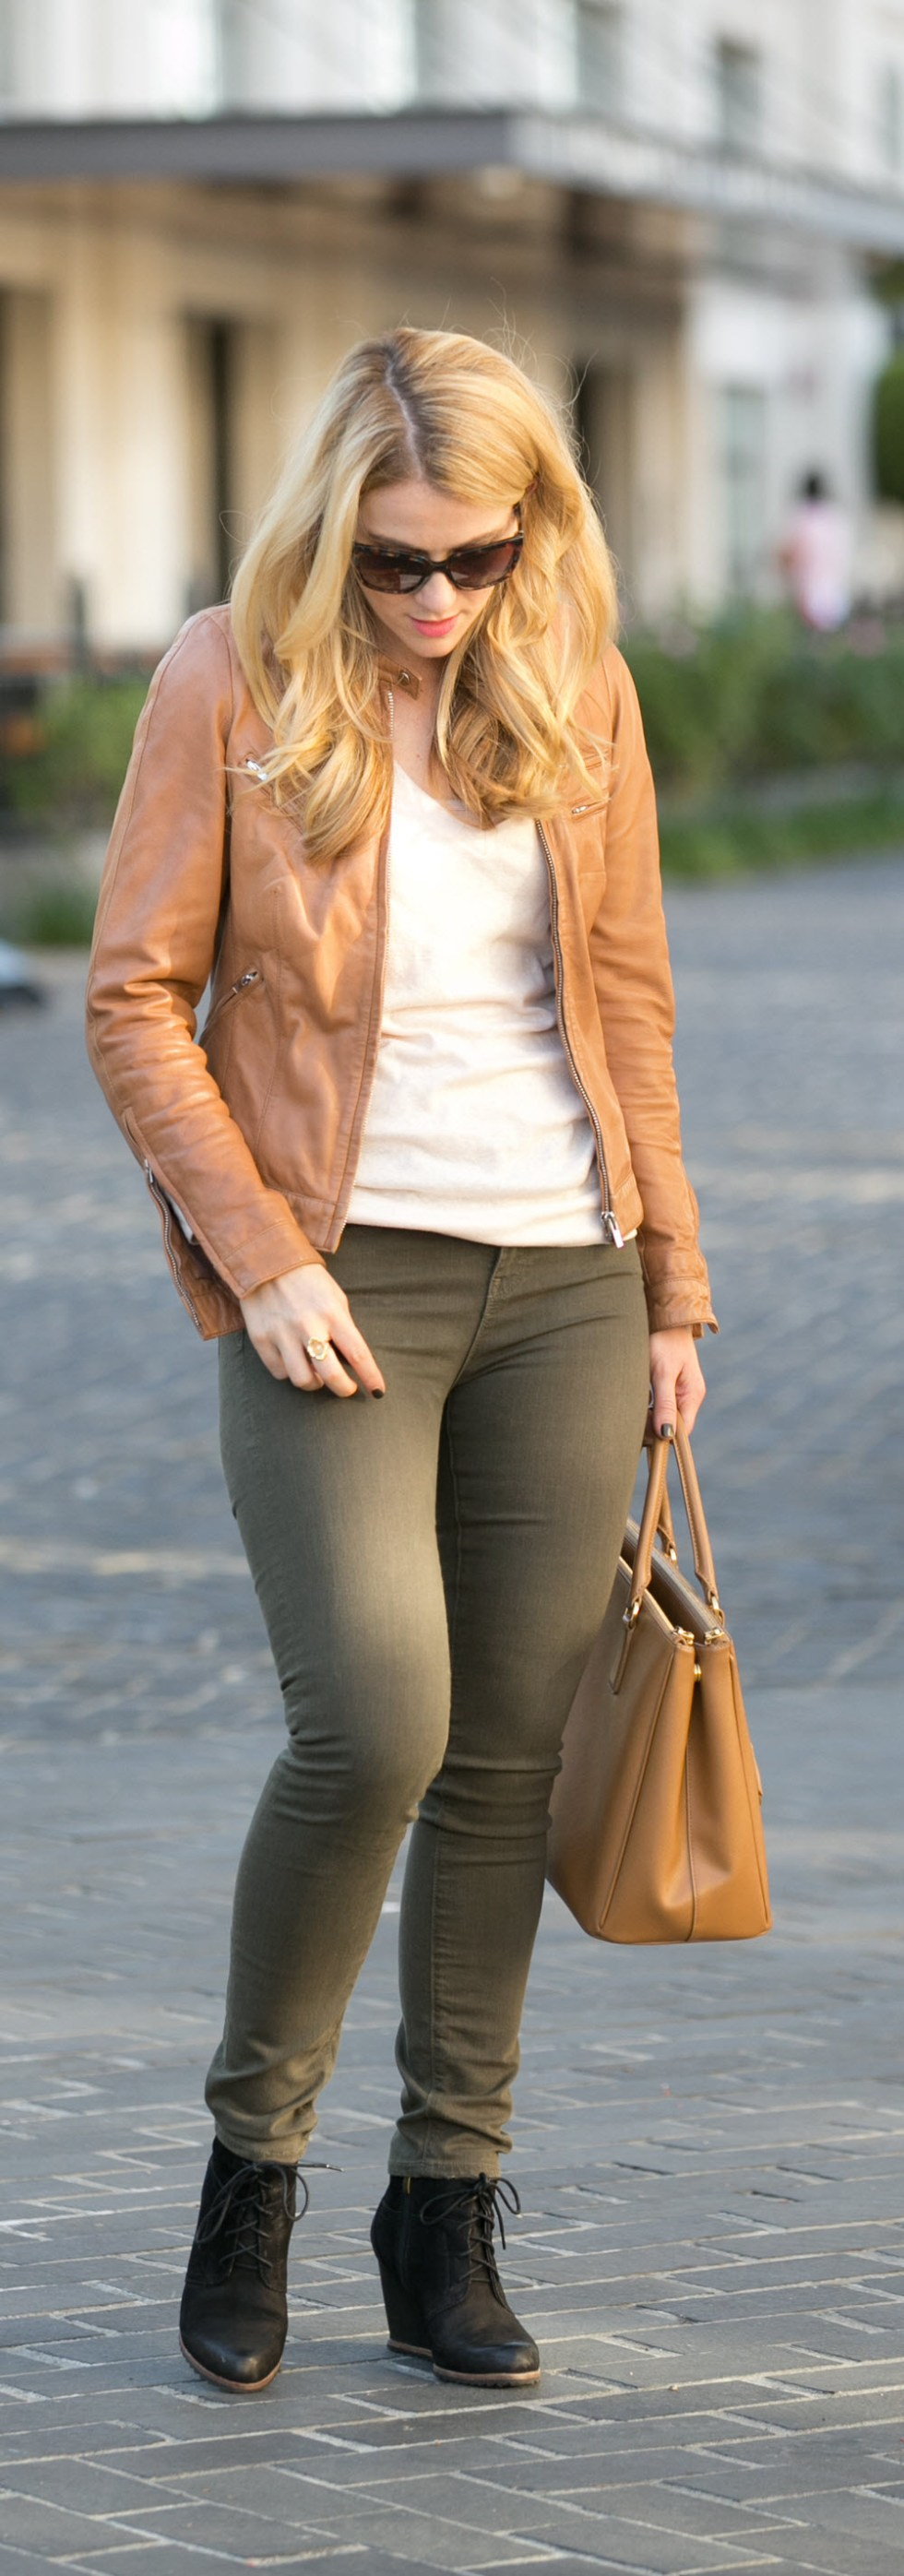 Tan Leather Bod & Christensen Jacket + Caramelo Prada Saffiano Tote Outfit